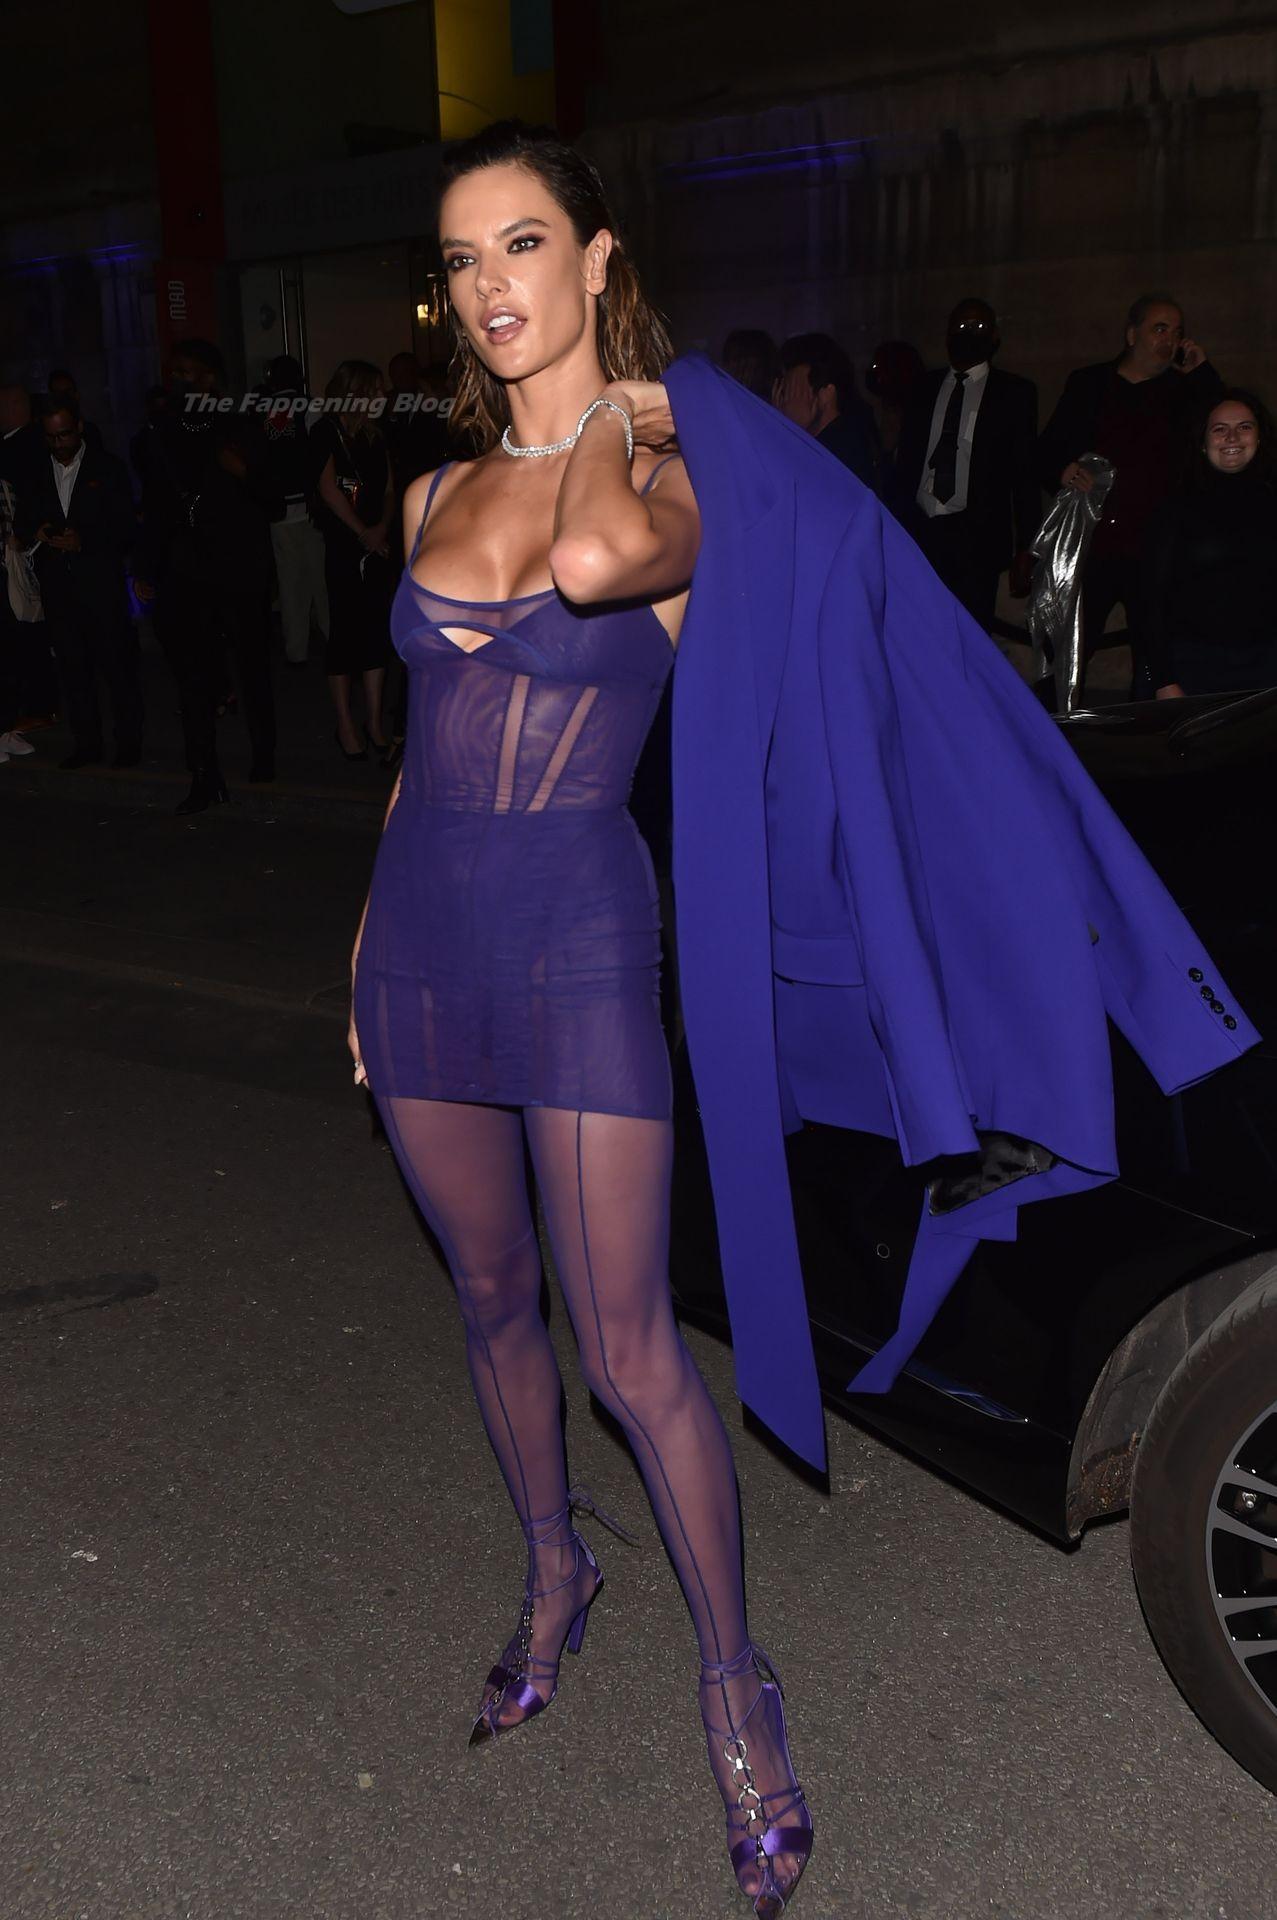 Alessandra-Ambrosio-Sexy-The-Fappening-Blog-78-1.jpg